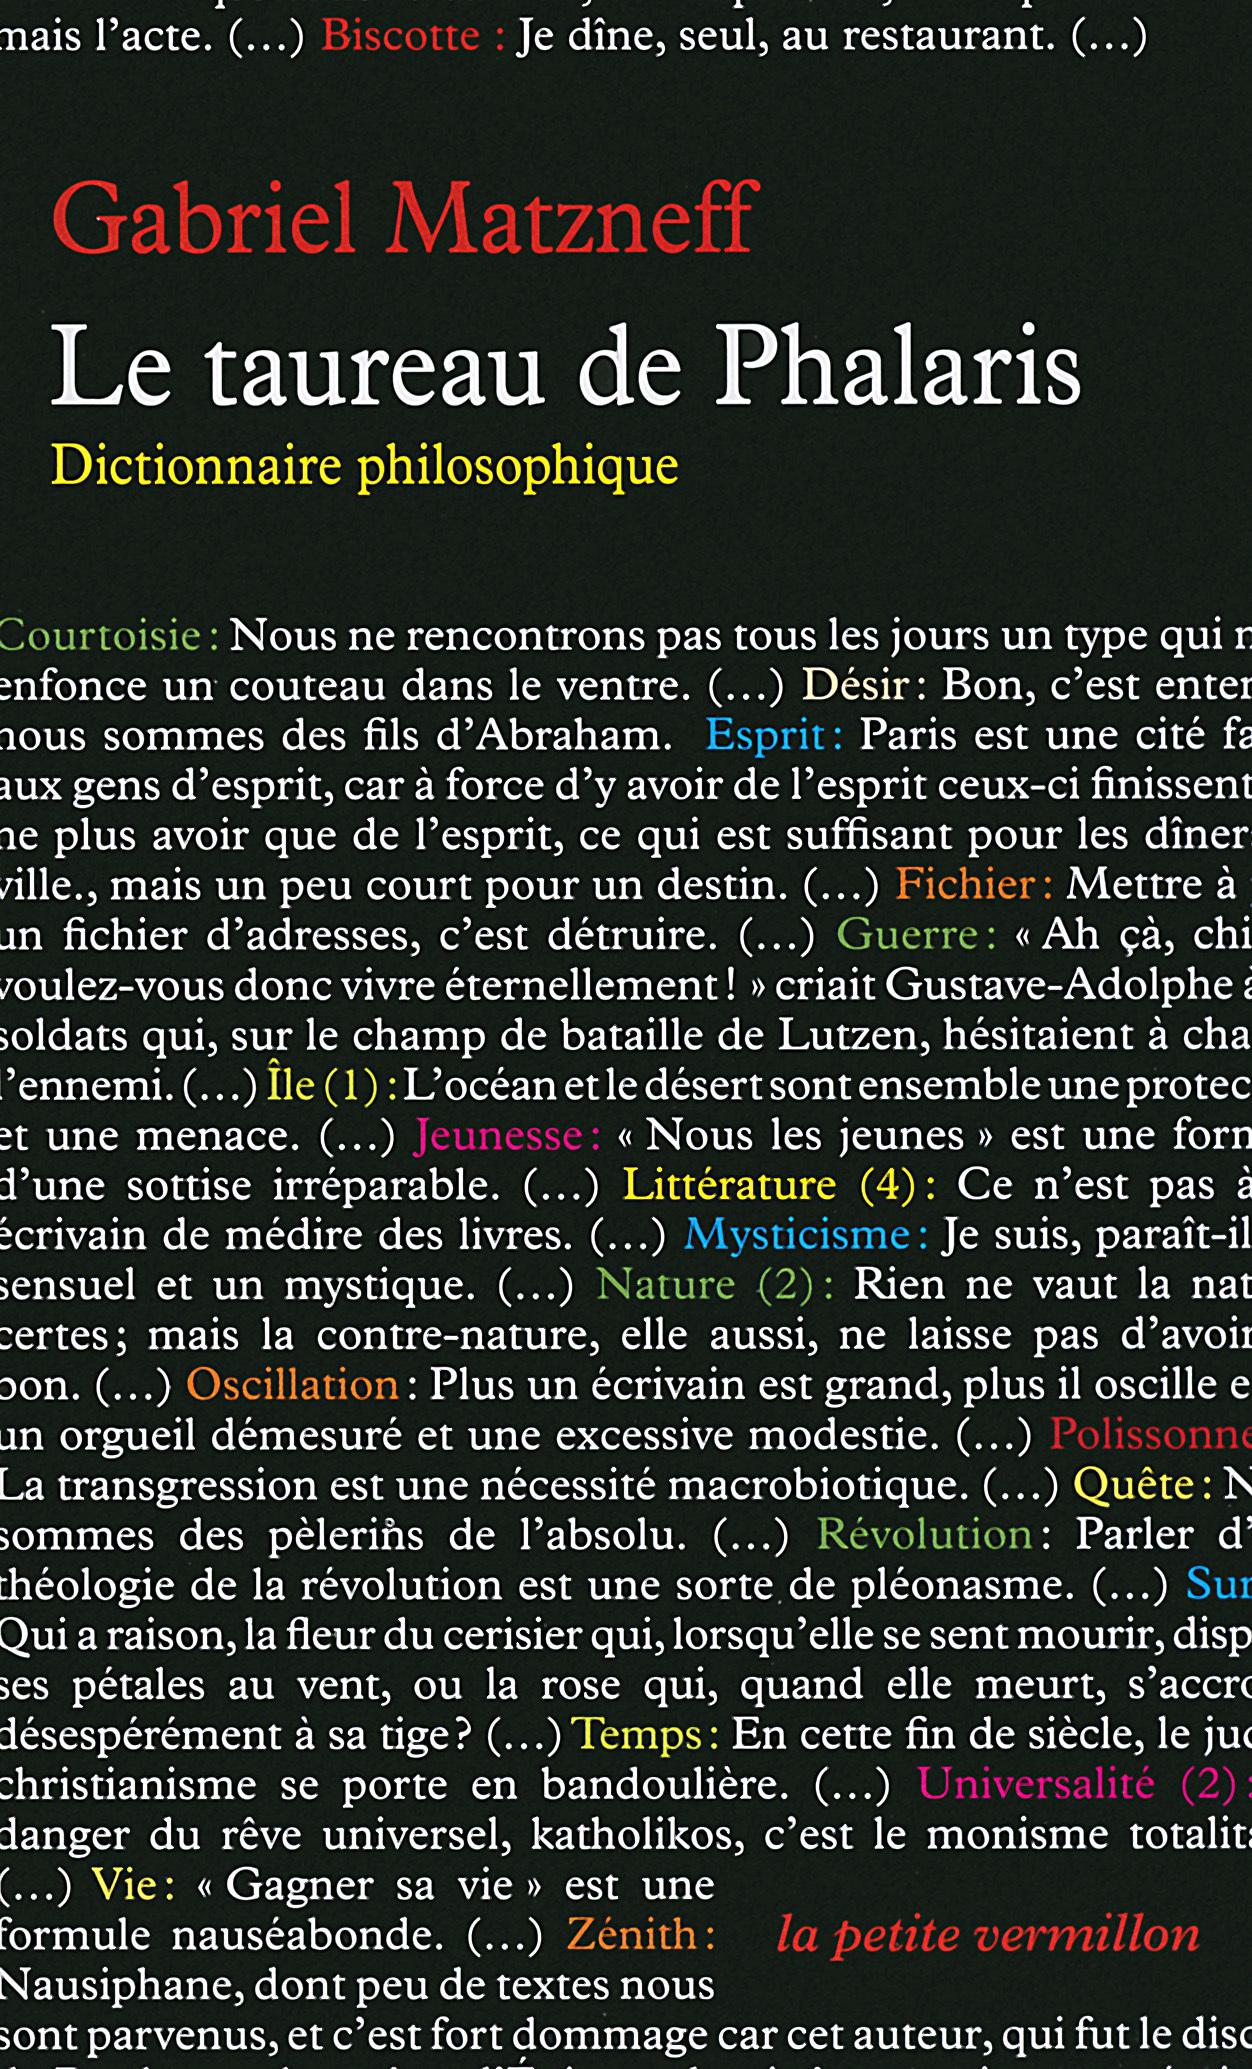 TAUREAU DE PHALARIS (DICTIONNAIRE PHILOSOPHIQU)